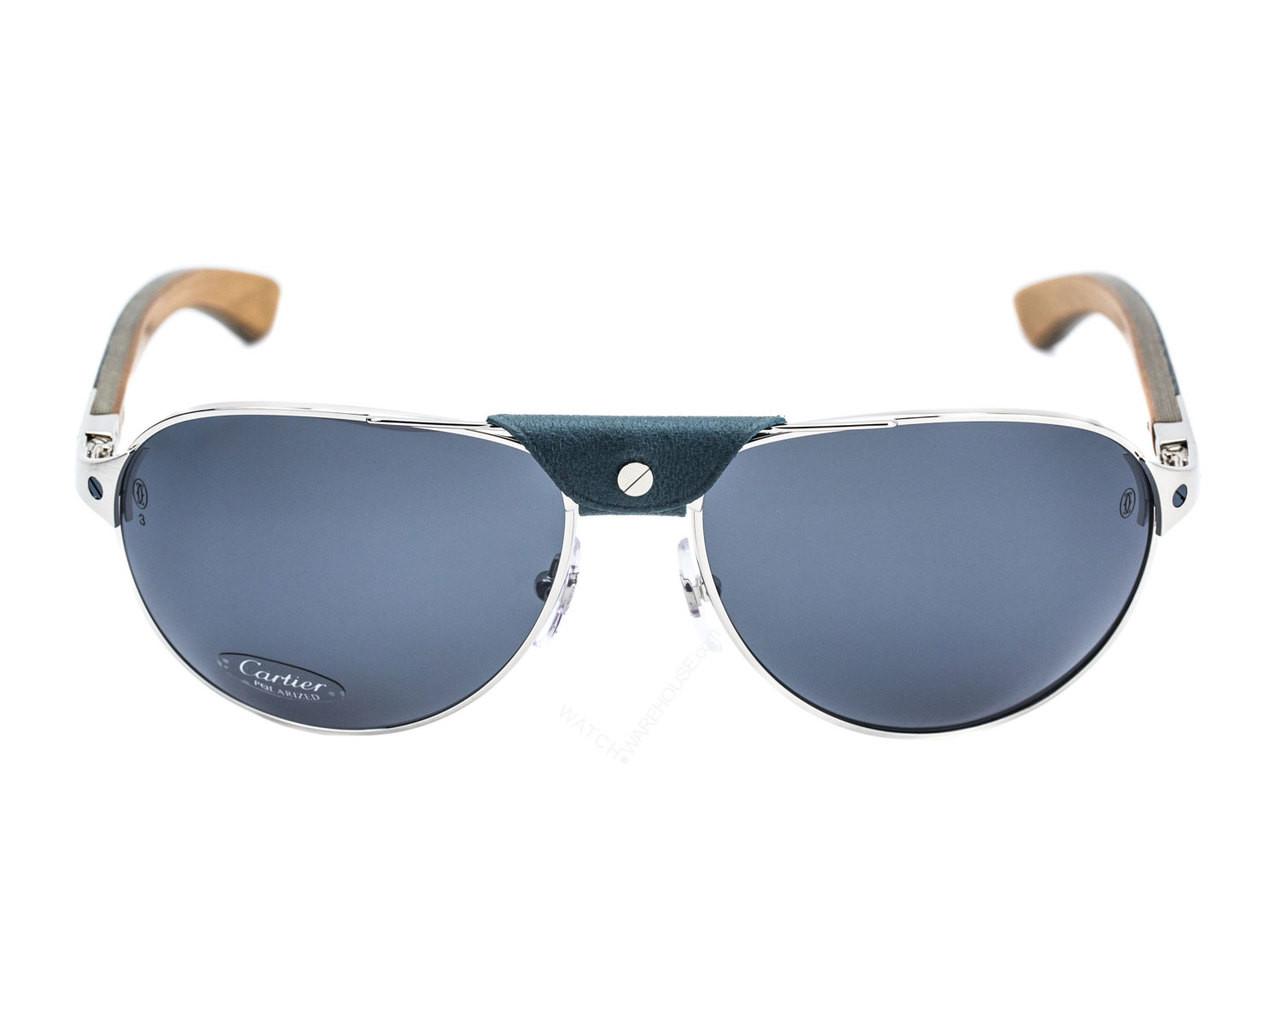 ebca809eefbf7 T8200941 Cartier Santos Louro Faya 61mm Wood Brushed Men s Sunglasses